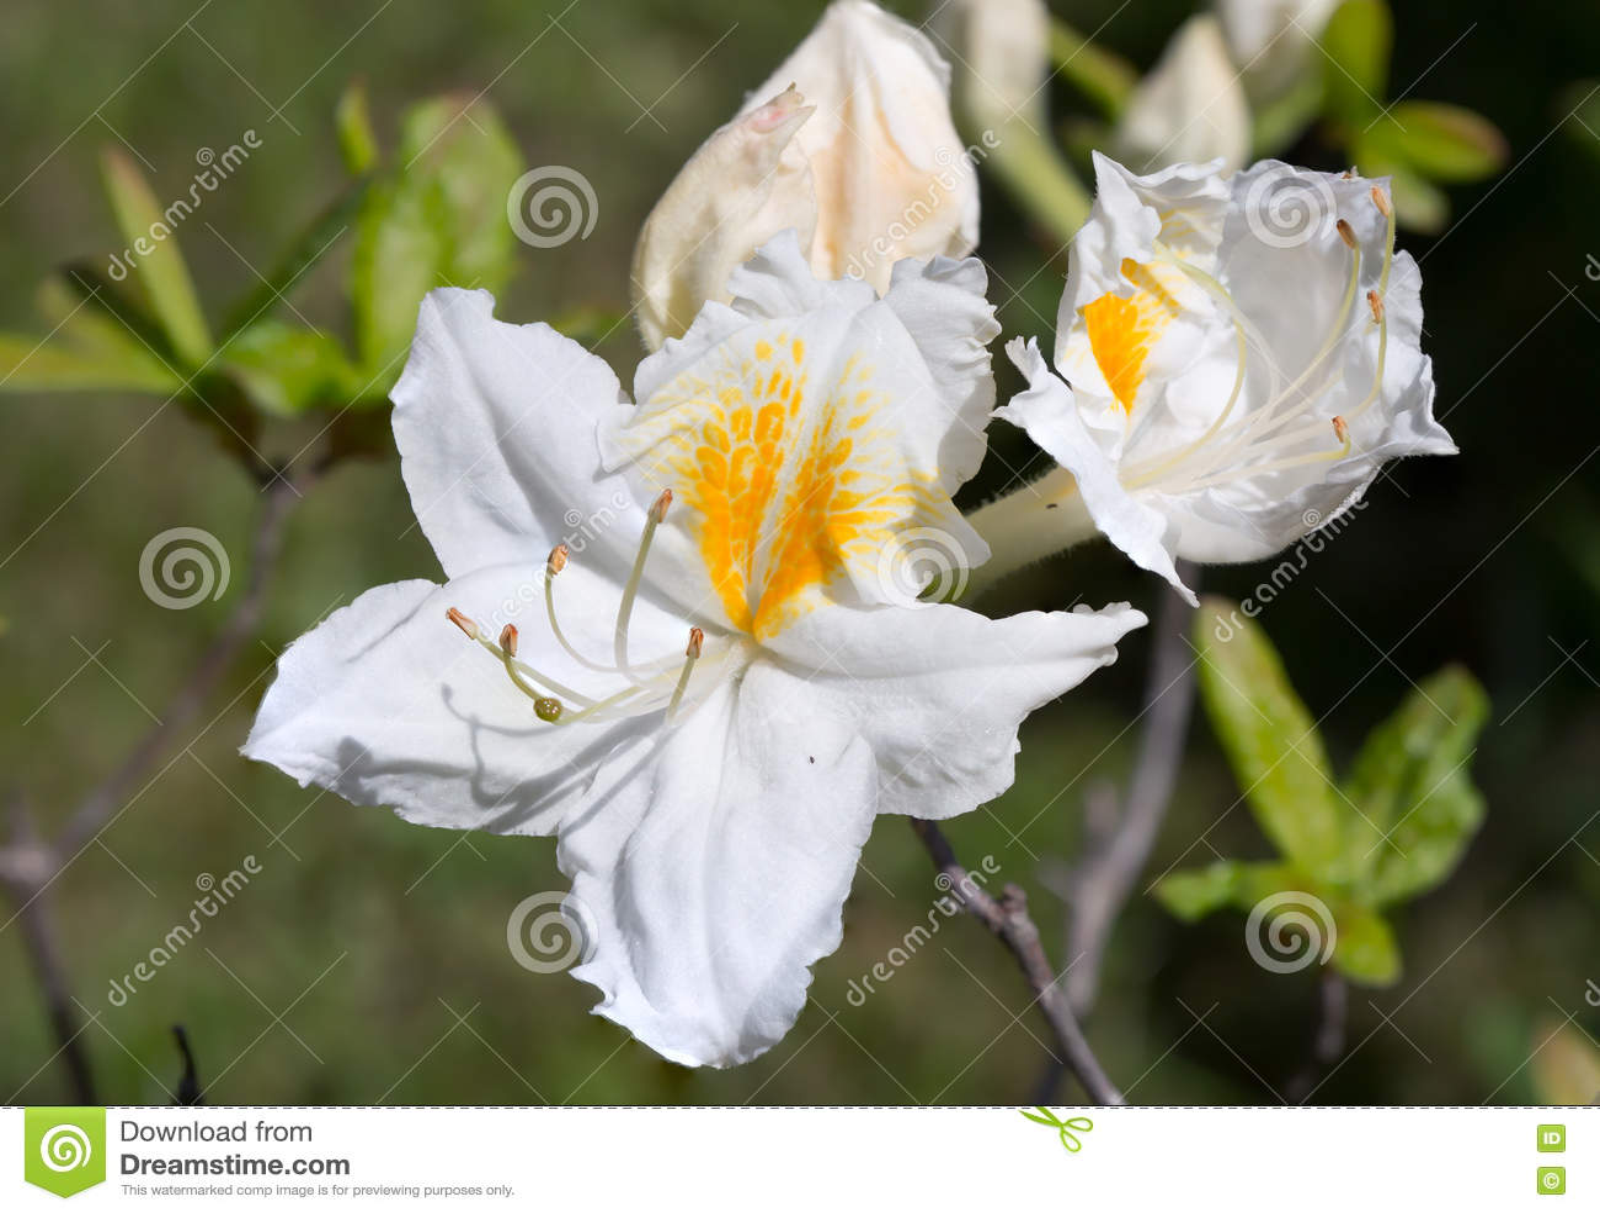 Download Белый цветок рододендрона стоковое изображение. изображение насчитывающей yellow - 72294023